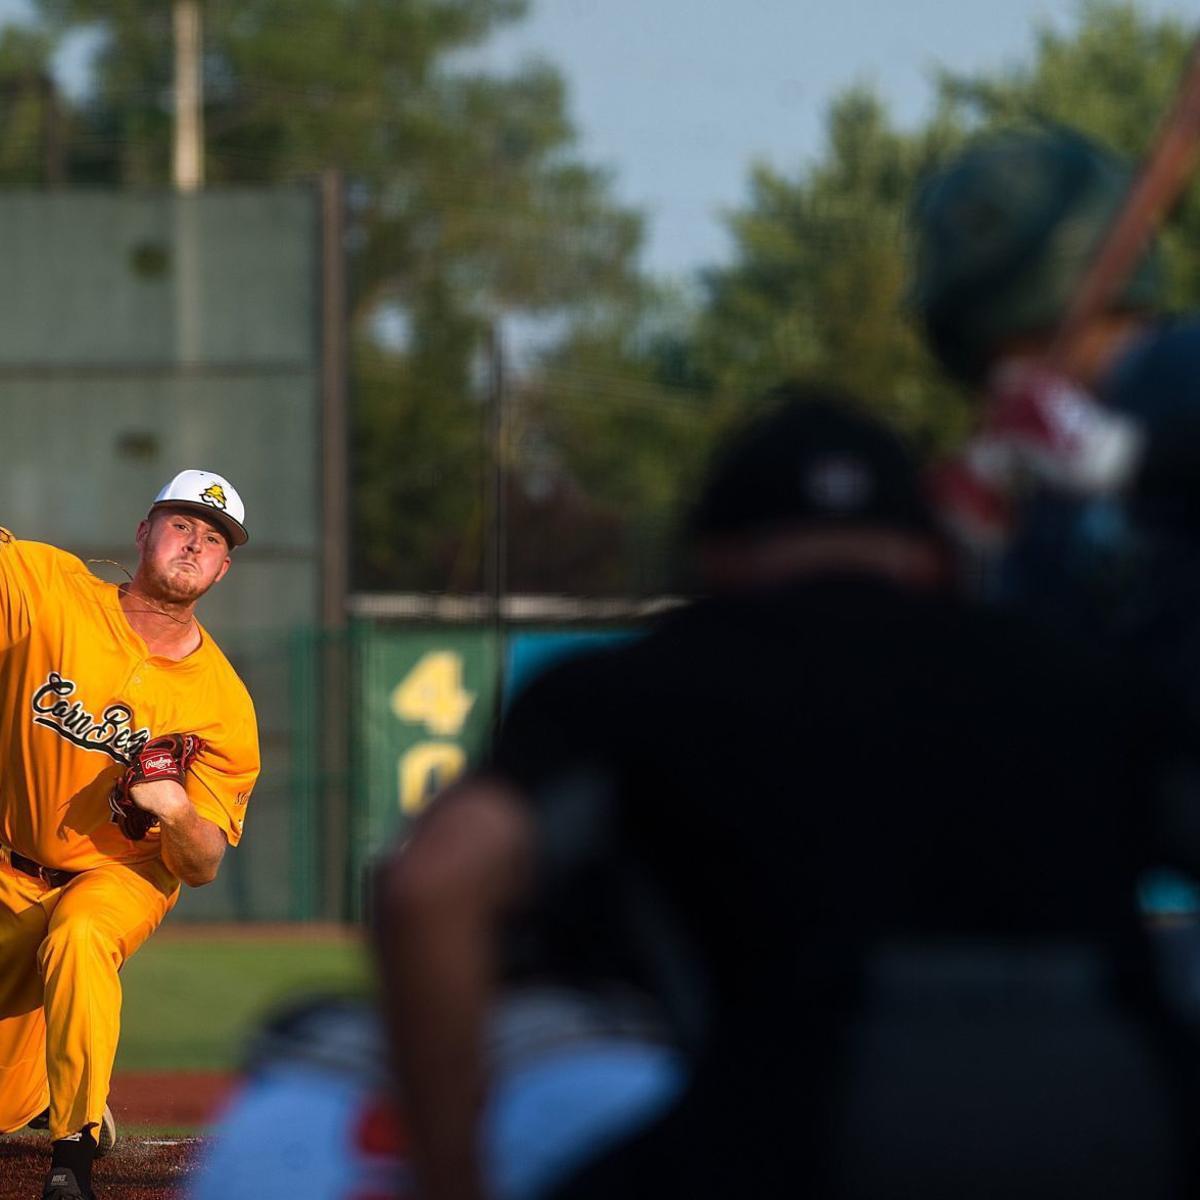 Cornbelters Prospect League Delay Season Opening Until July 1 Baseball Pantagraph Com